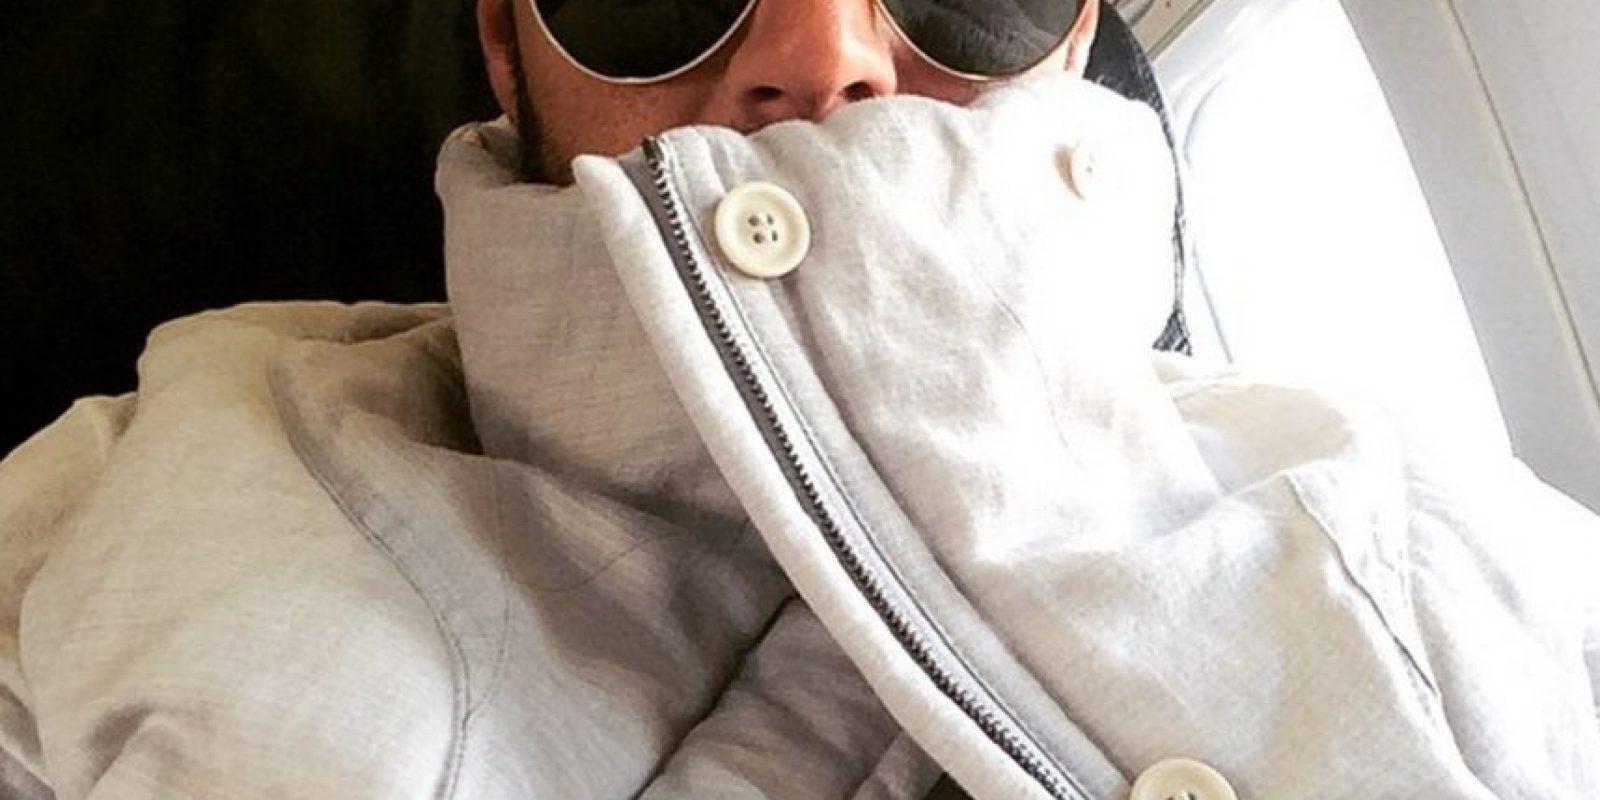 A lo largo de su carrera ha recibido premios como 1 Grammy, 5 Latin Grammys, 3 Billboard, 8 Billboard Latin Music Awards, 8 MTVs, 8 World Music Awards y 2 American Music Awards Foto:Instagram @ricky_martin